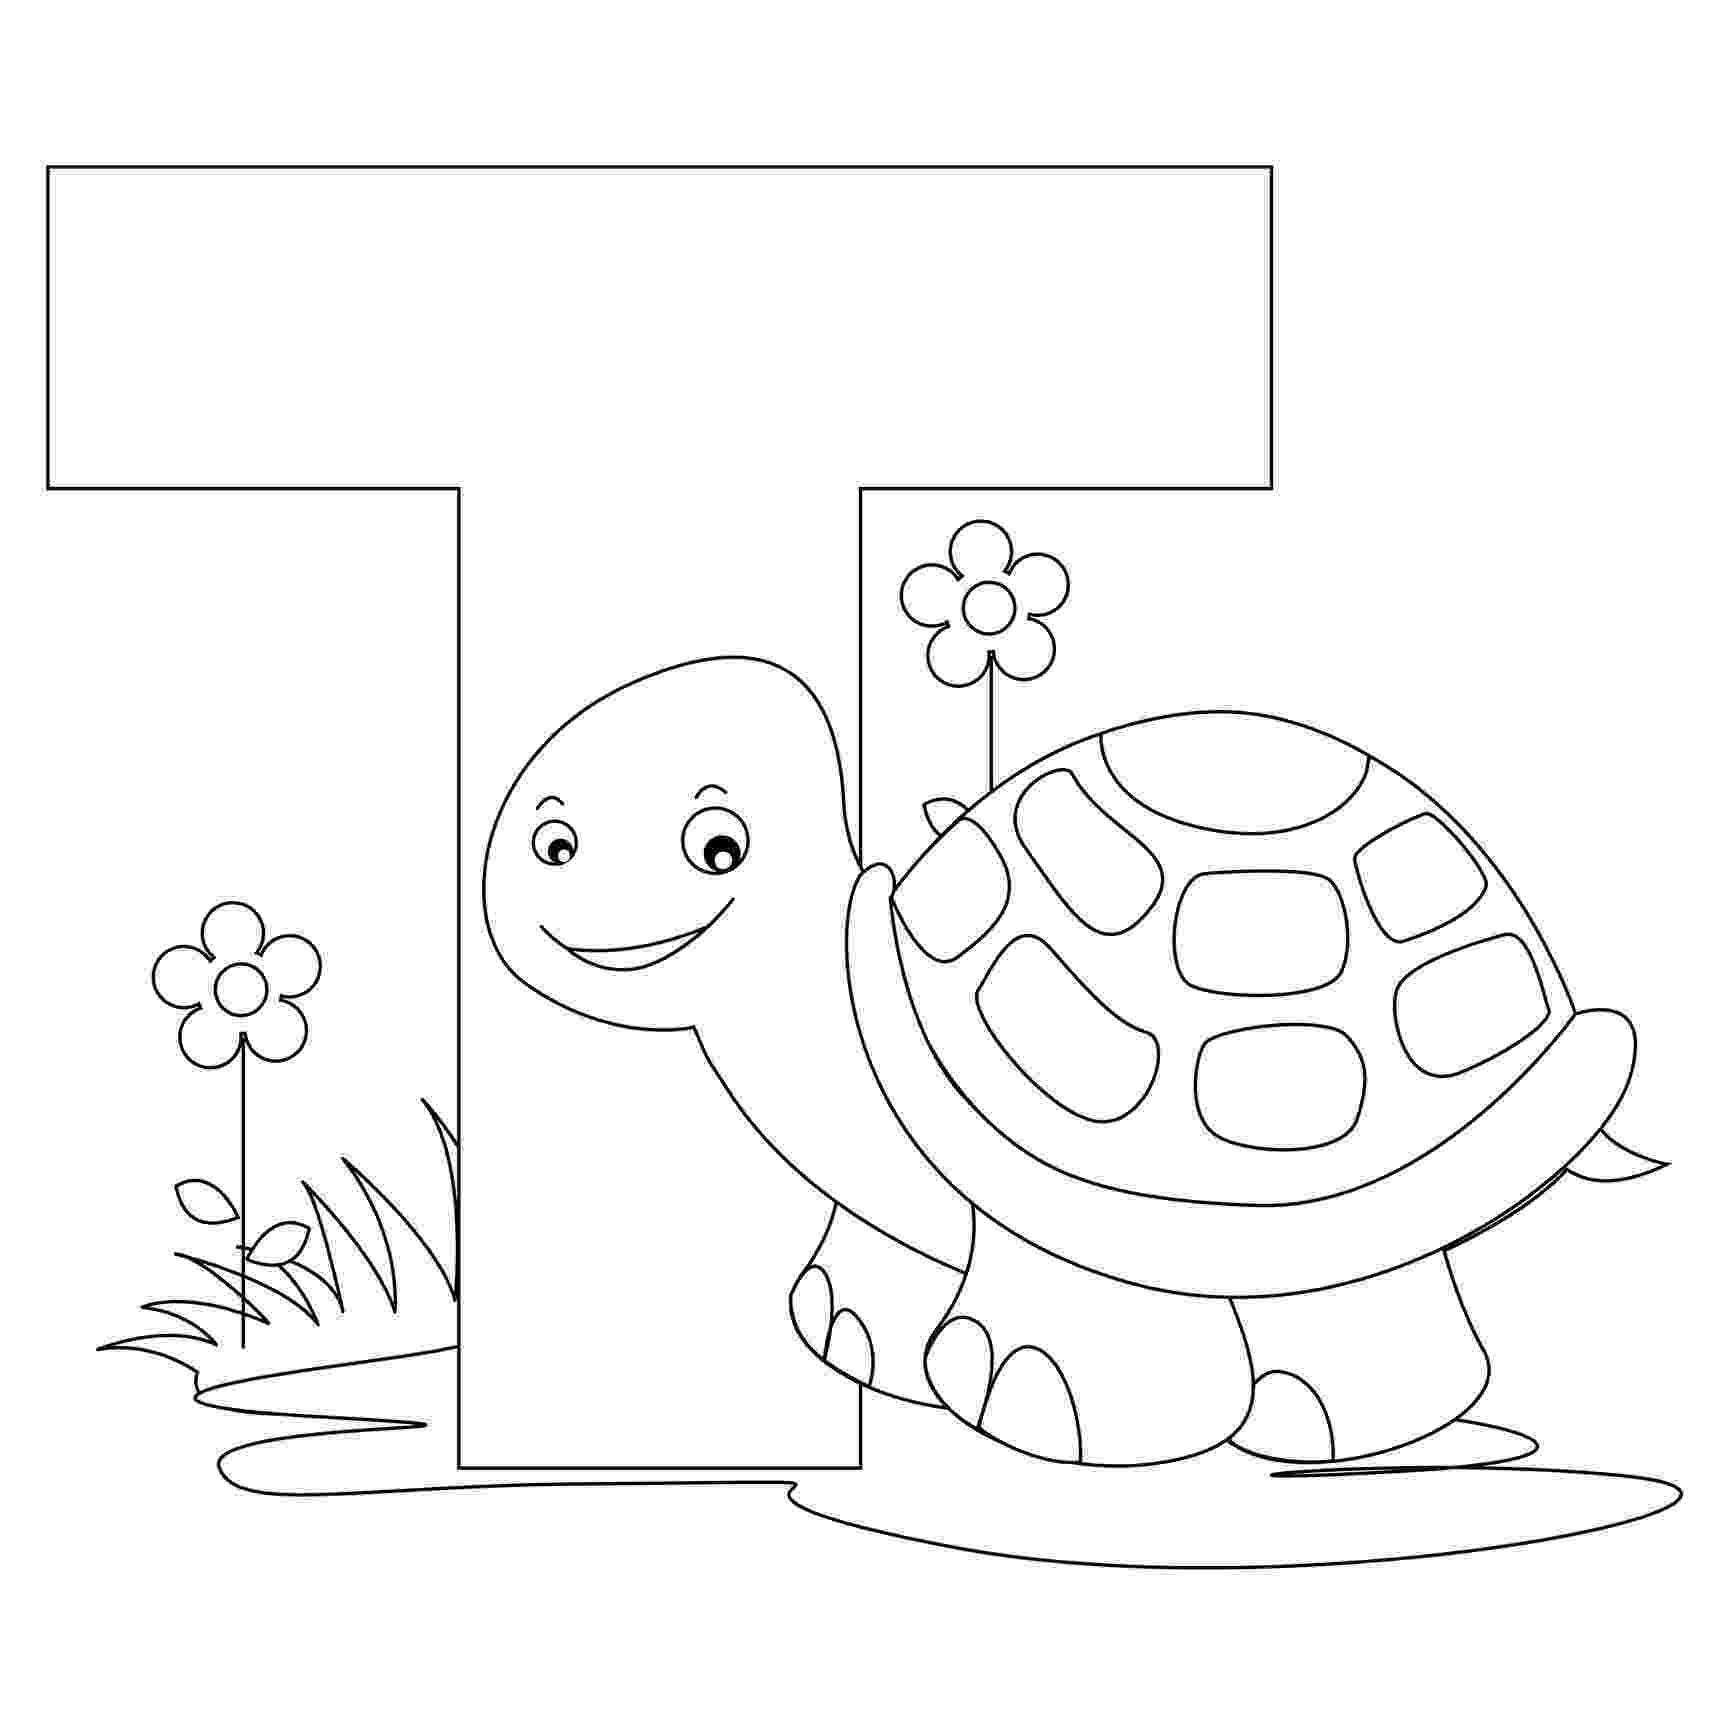 abc coloring sheets free printable alphabet coloring pages for kids best sheets abc coloring 1 1